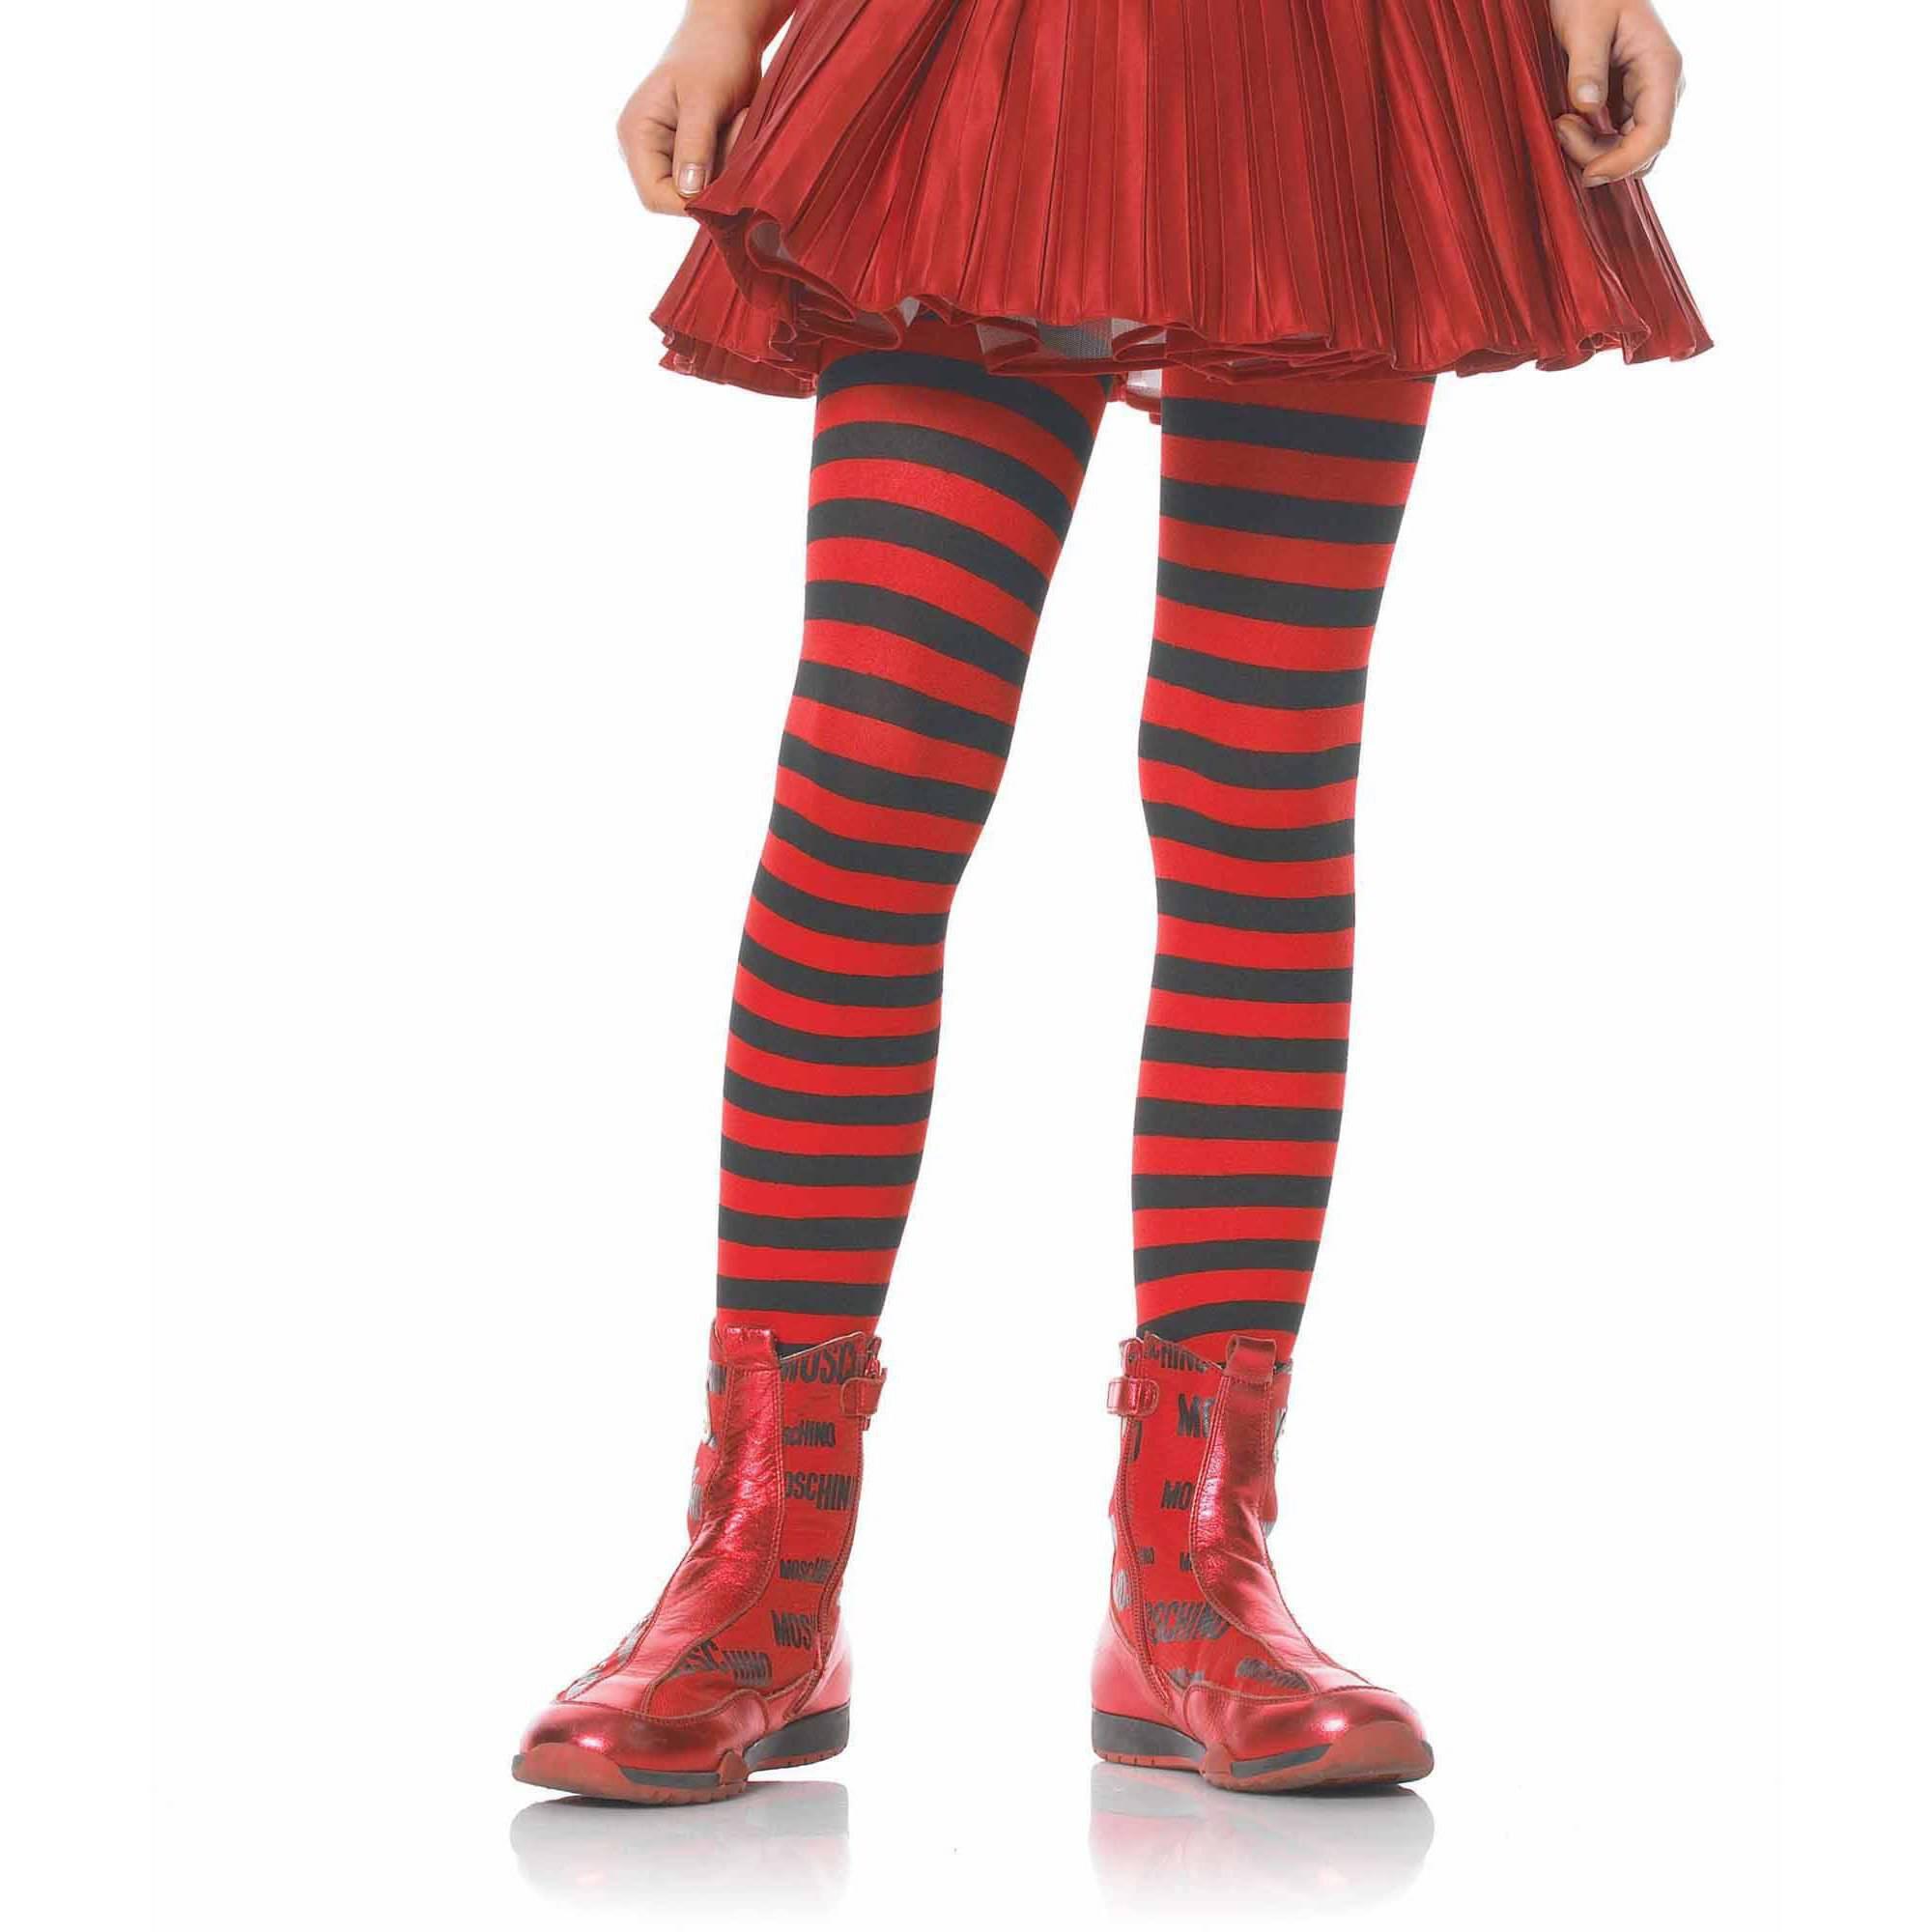 Leg Avenue Stripe Tights Child Halloween Accessory